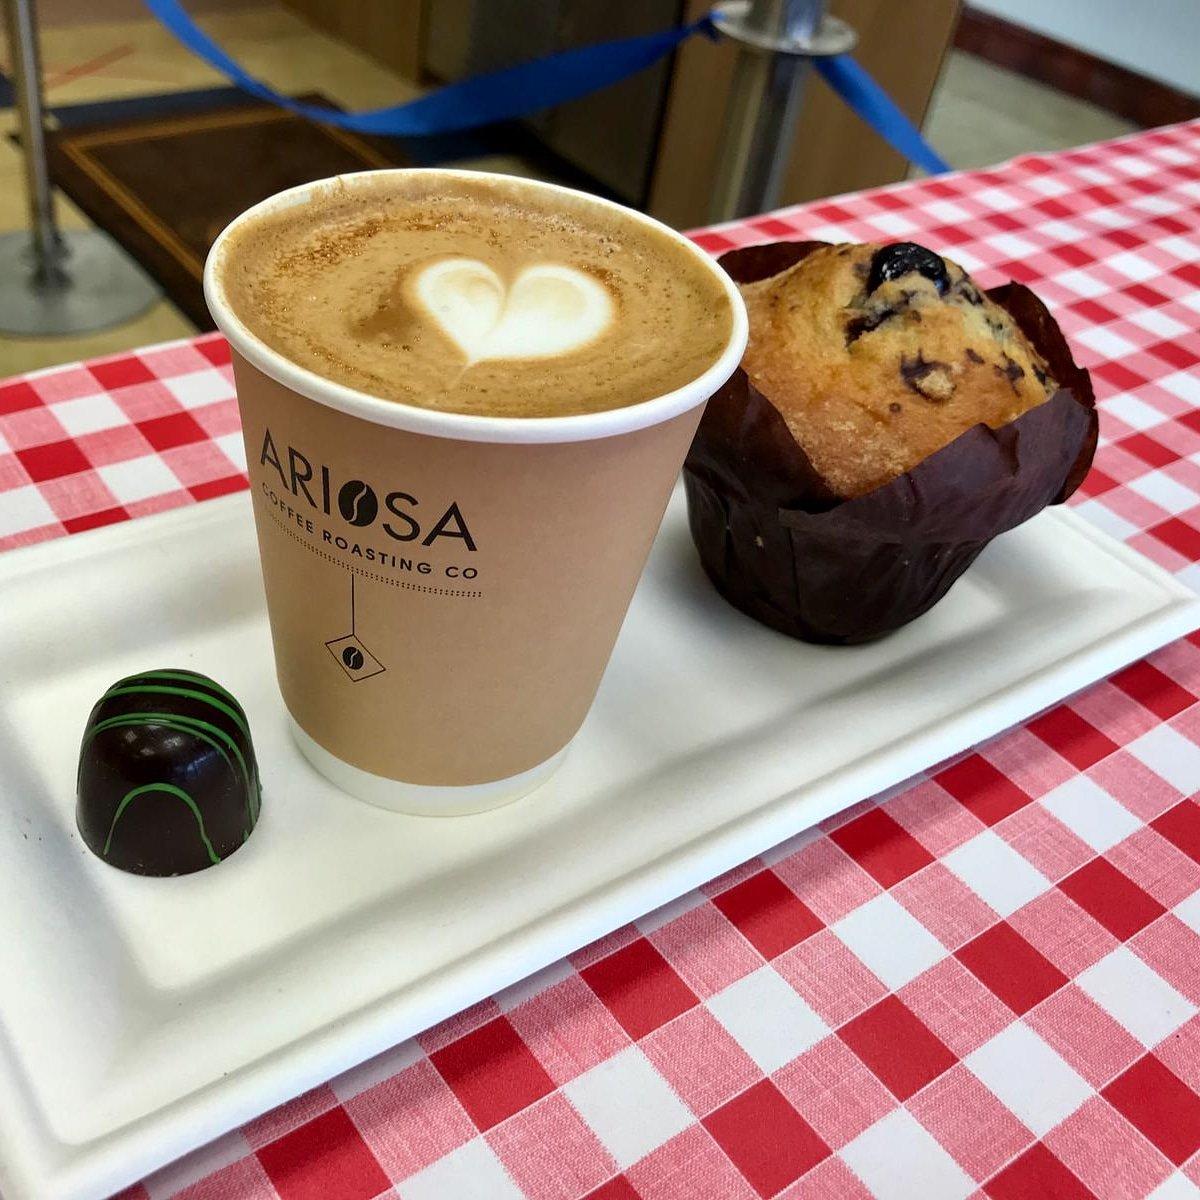 A coffee a day, keeps the grumpy away  Enjoy your day everyone. #chezemily #shoplocal #treatyourself pic.twitter.com/5PszpzWt2w